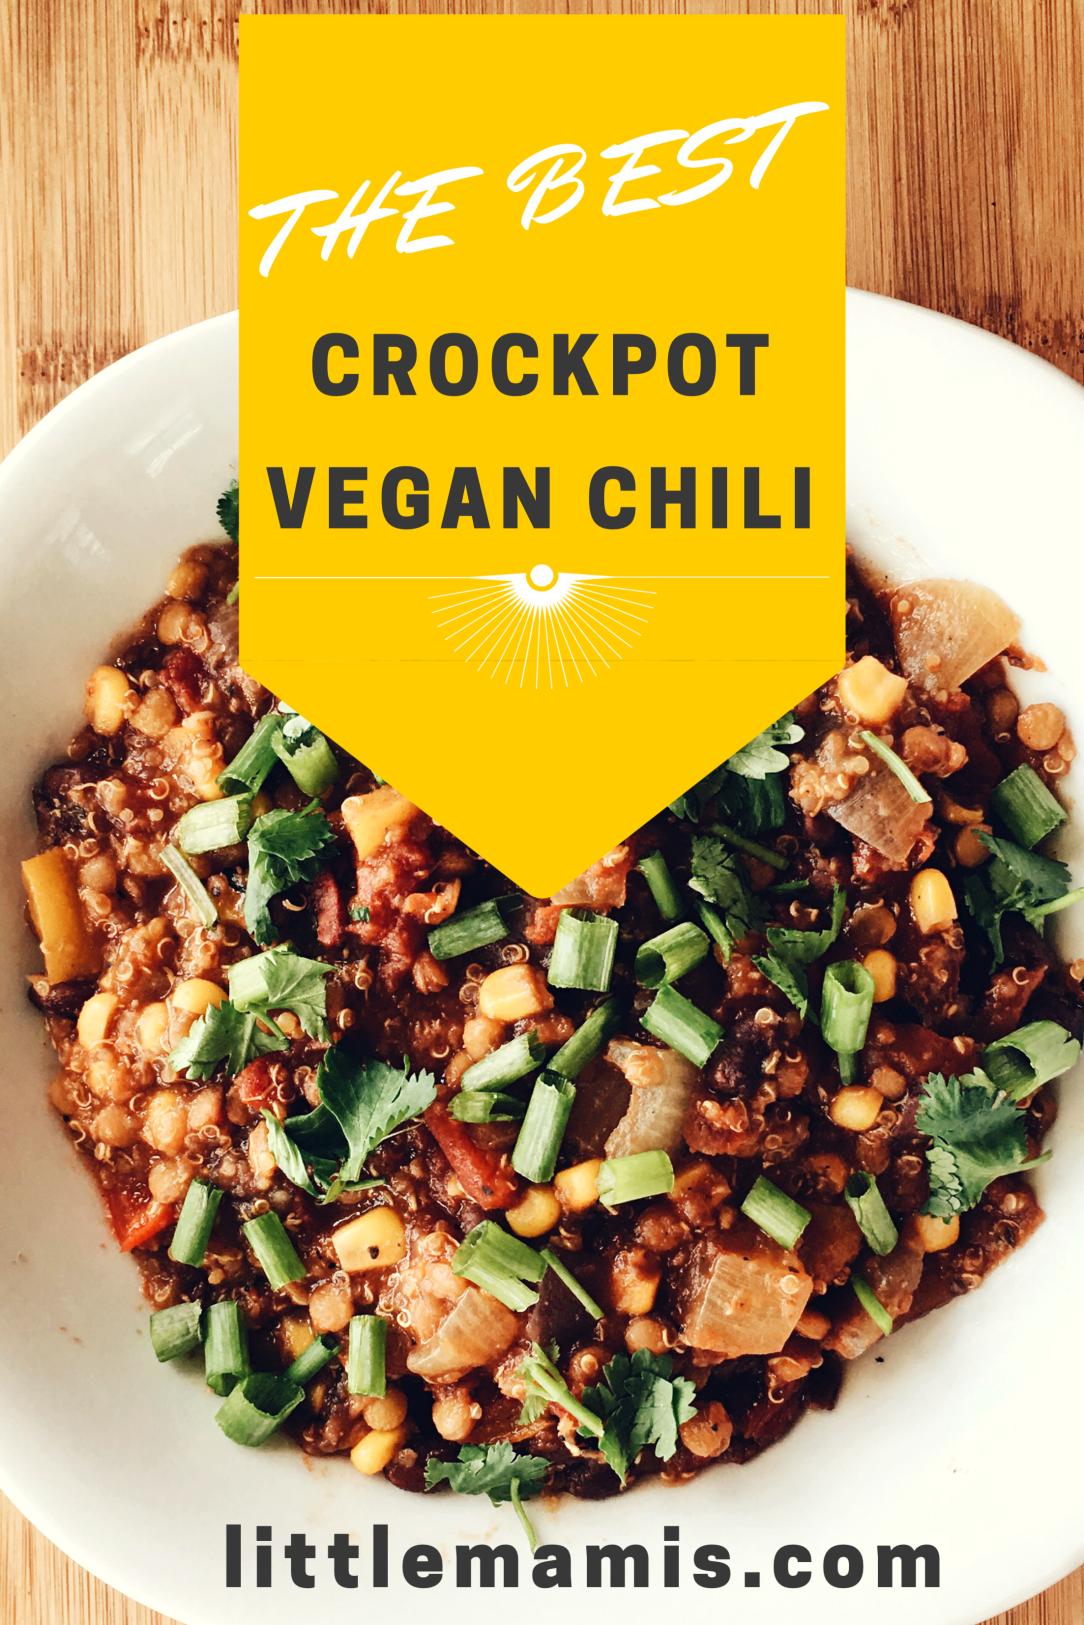 The Best Crockpot Vegan Chili So Easy